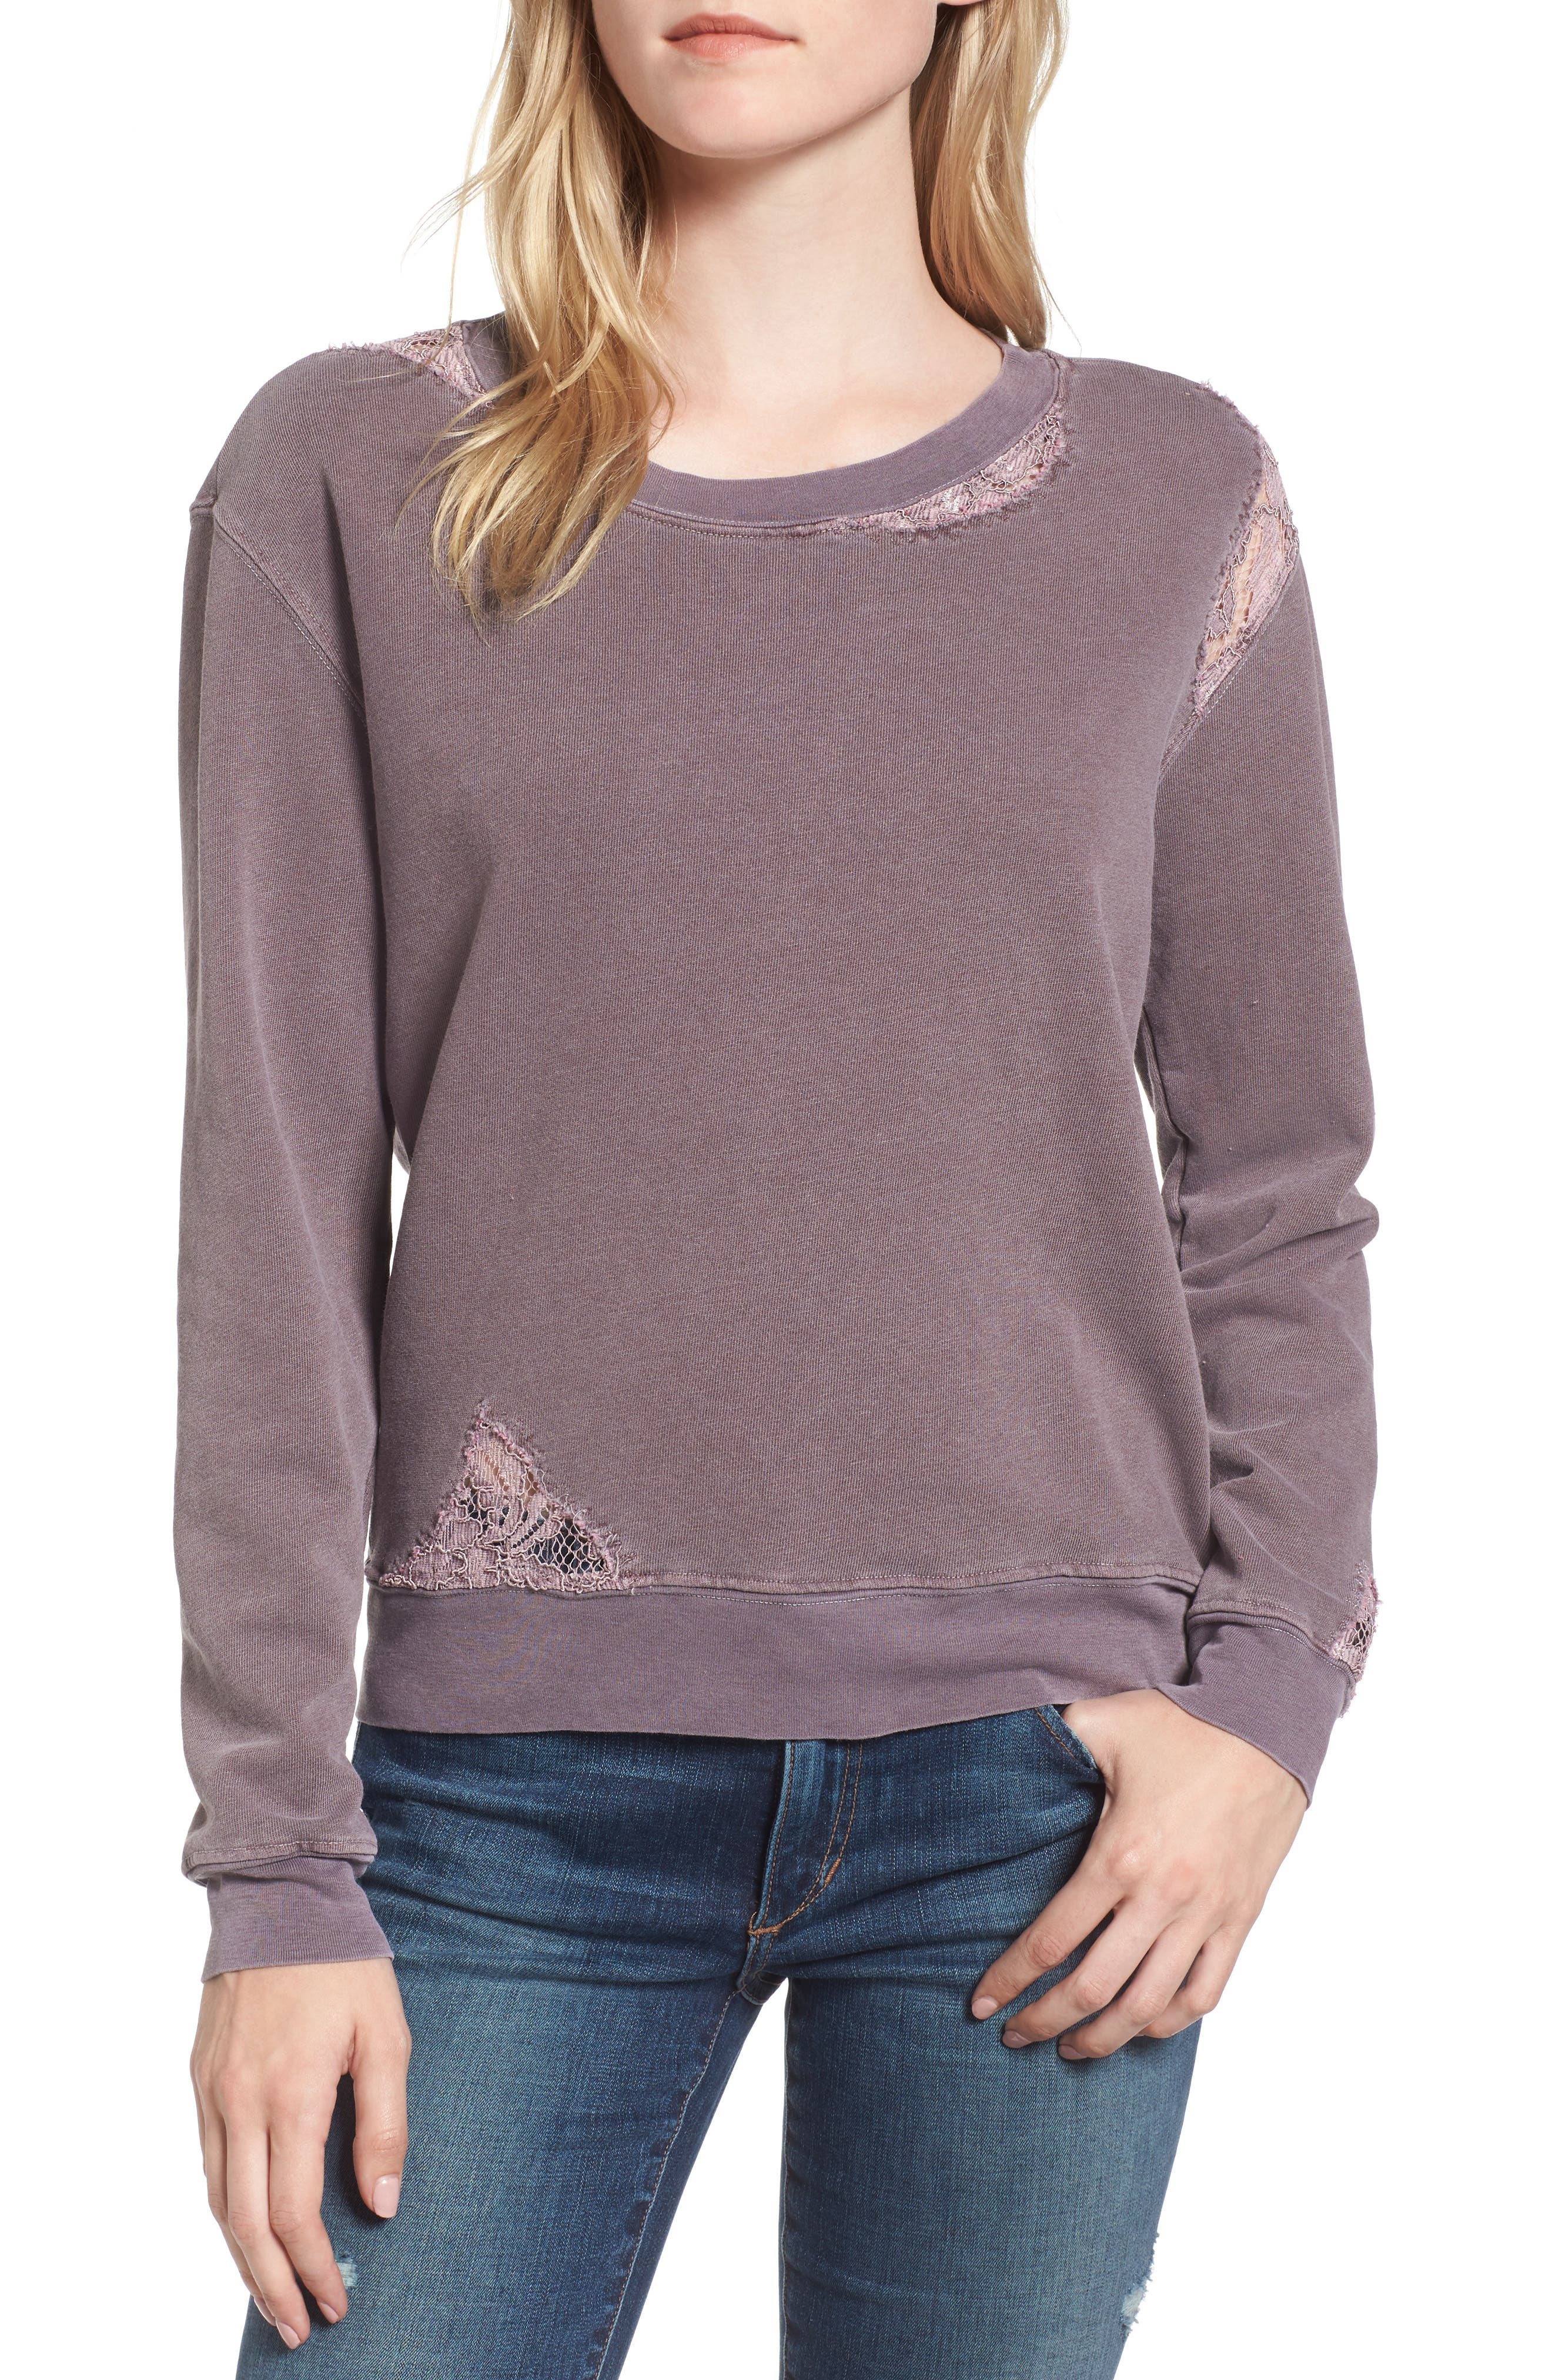 Stateside Lace Trim Sweatshirt